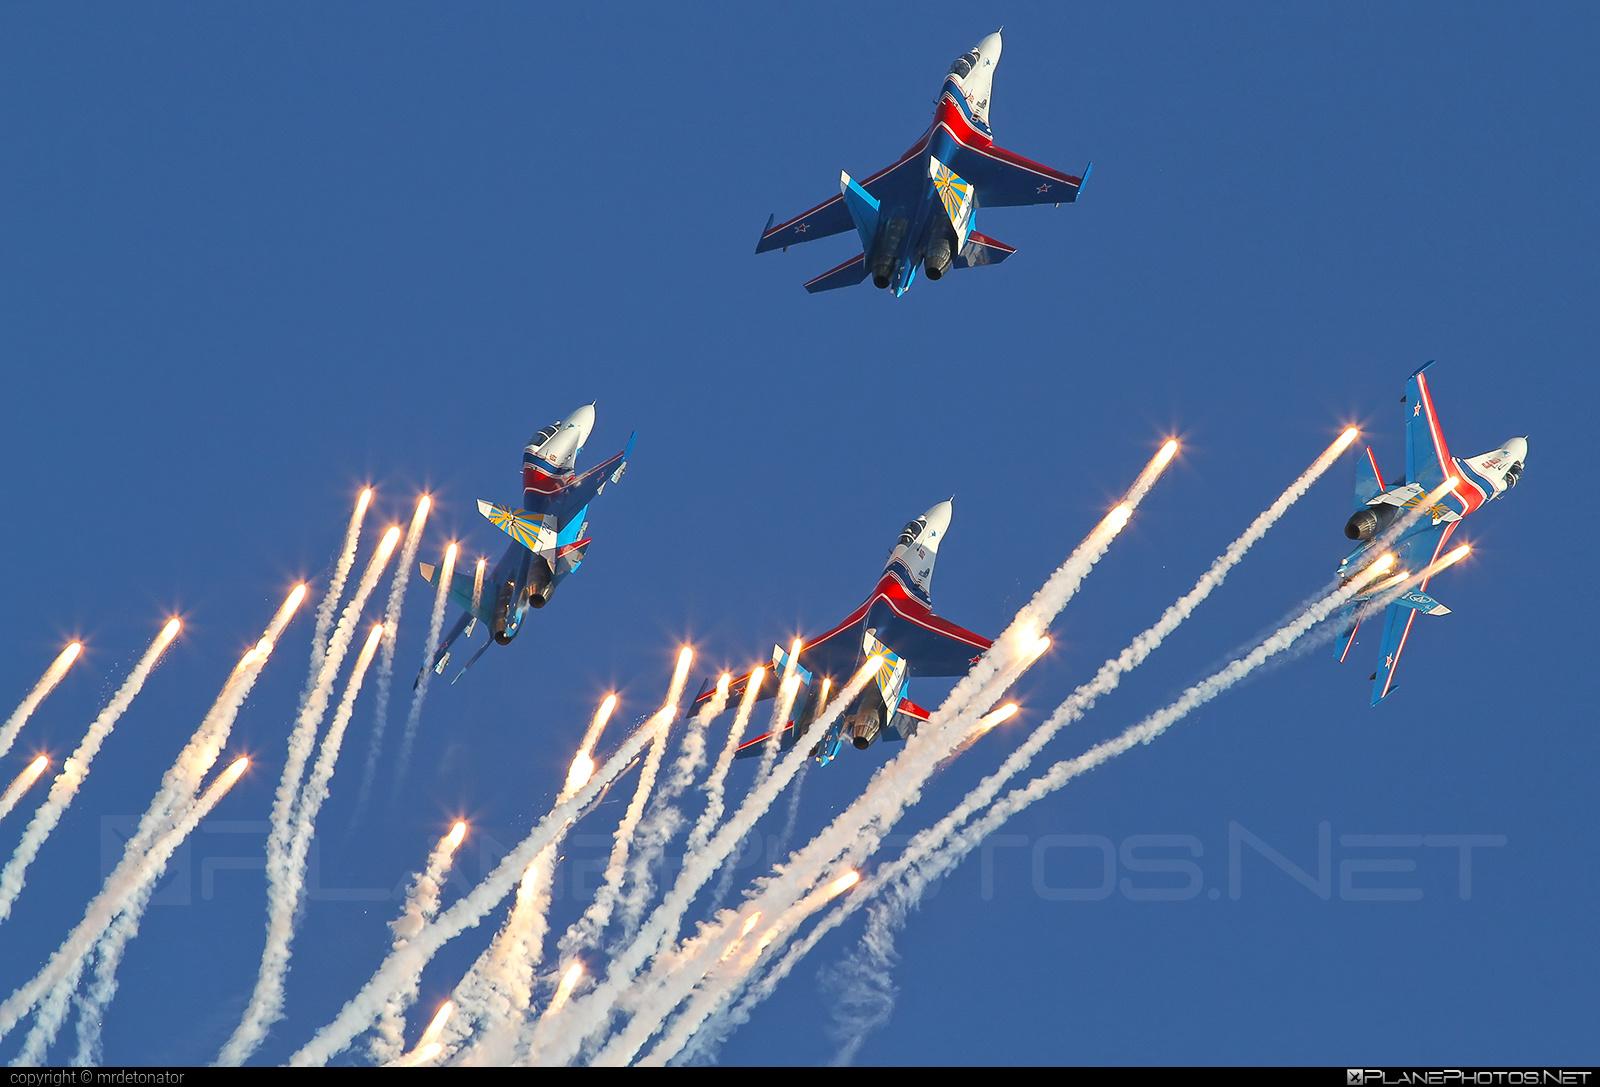 Sukhoi Su-27P - 08 operated by Voyenno-vozdushnye sily Rossii (Russian Air Force) #su27 #su27p #sukhoi #sukhoi27